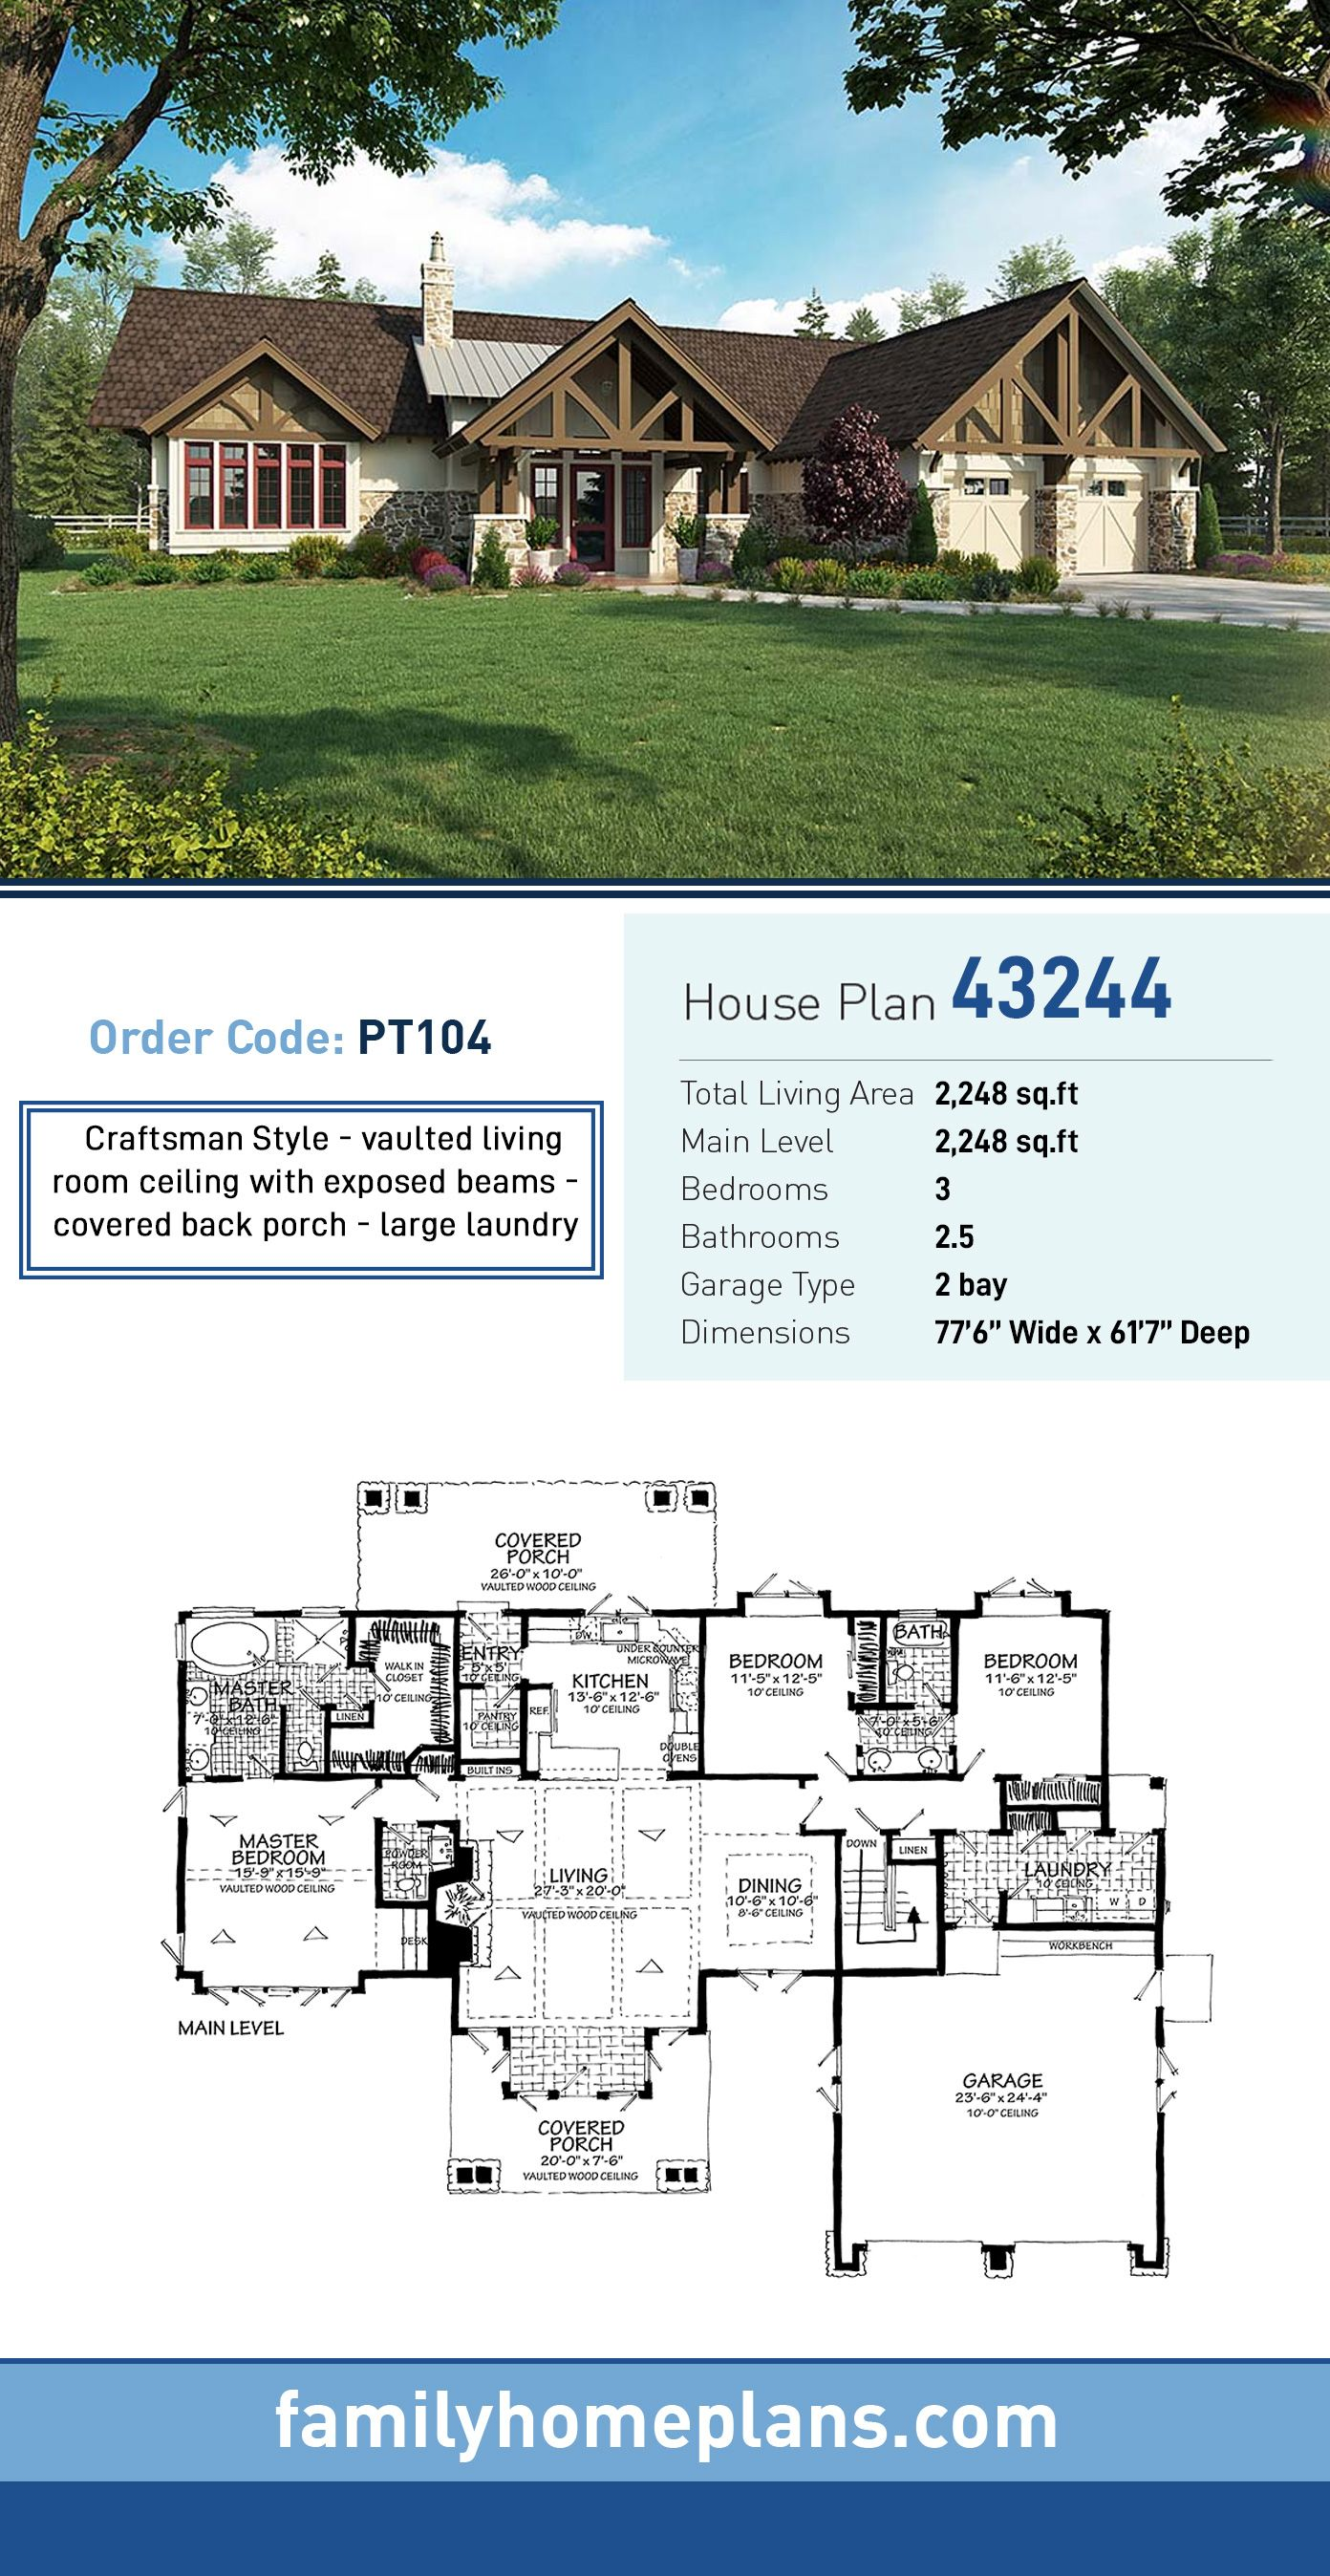 Craftsman Style Ranch Homes : craftsman, style, ranch, homes, Ranch, Style, House, 43244, Bath,, Garage, Plans,, Craftsman, Castle, Design